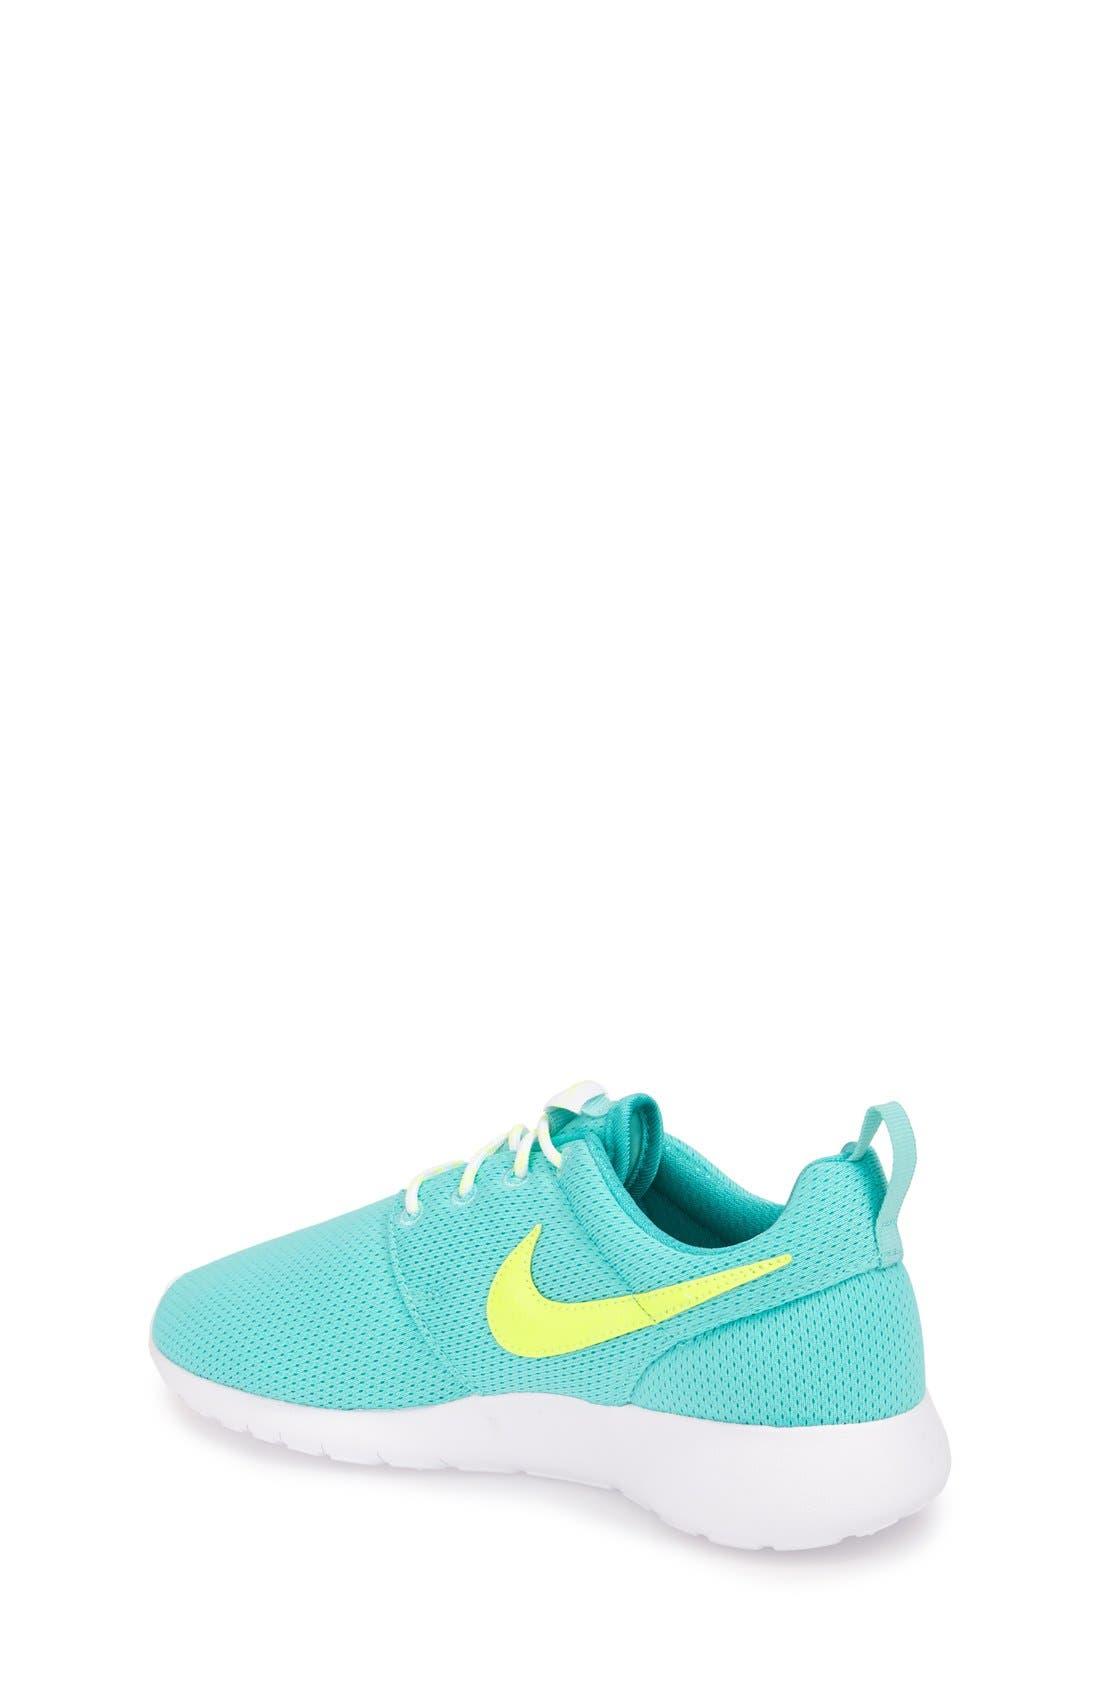 'Roshe Run' Athletic Shoe,                             Alternate thumbnail 96, color,